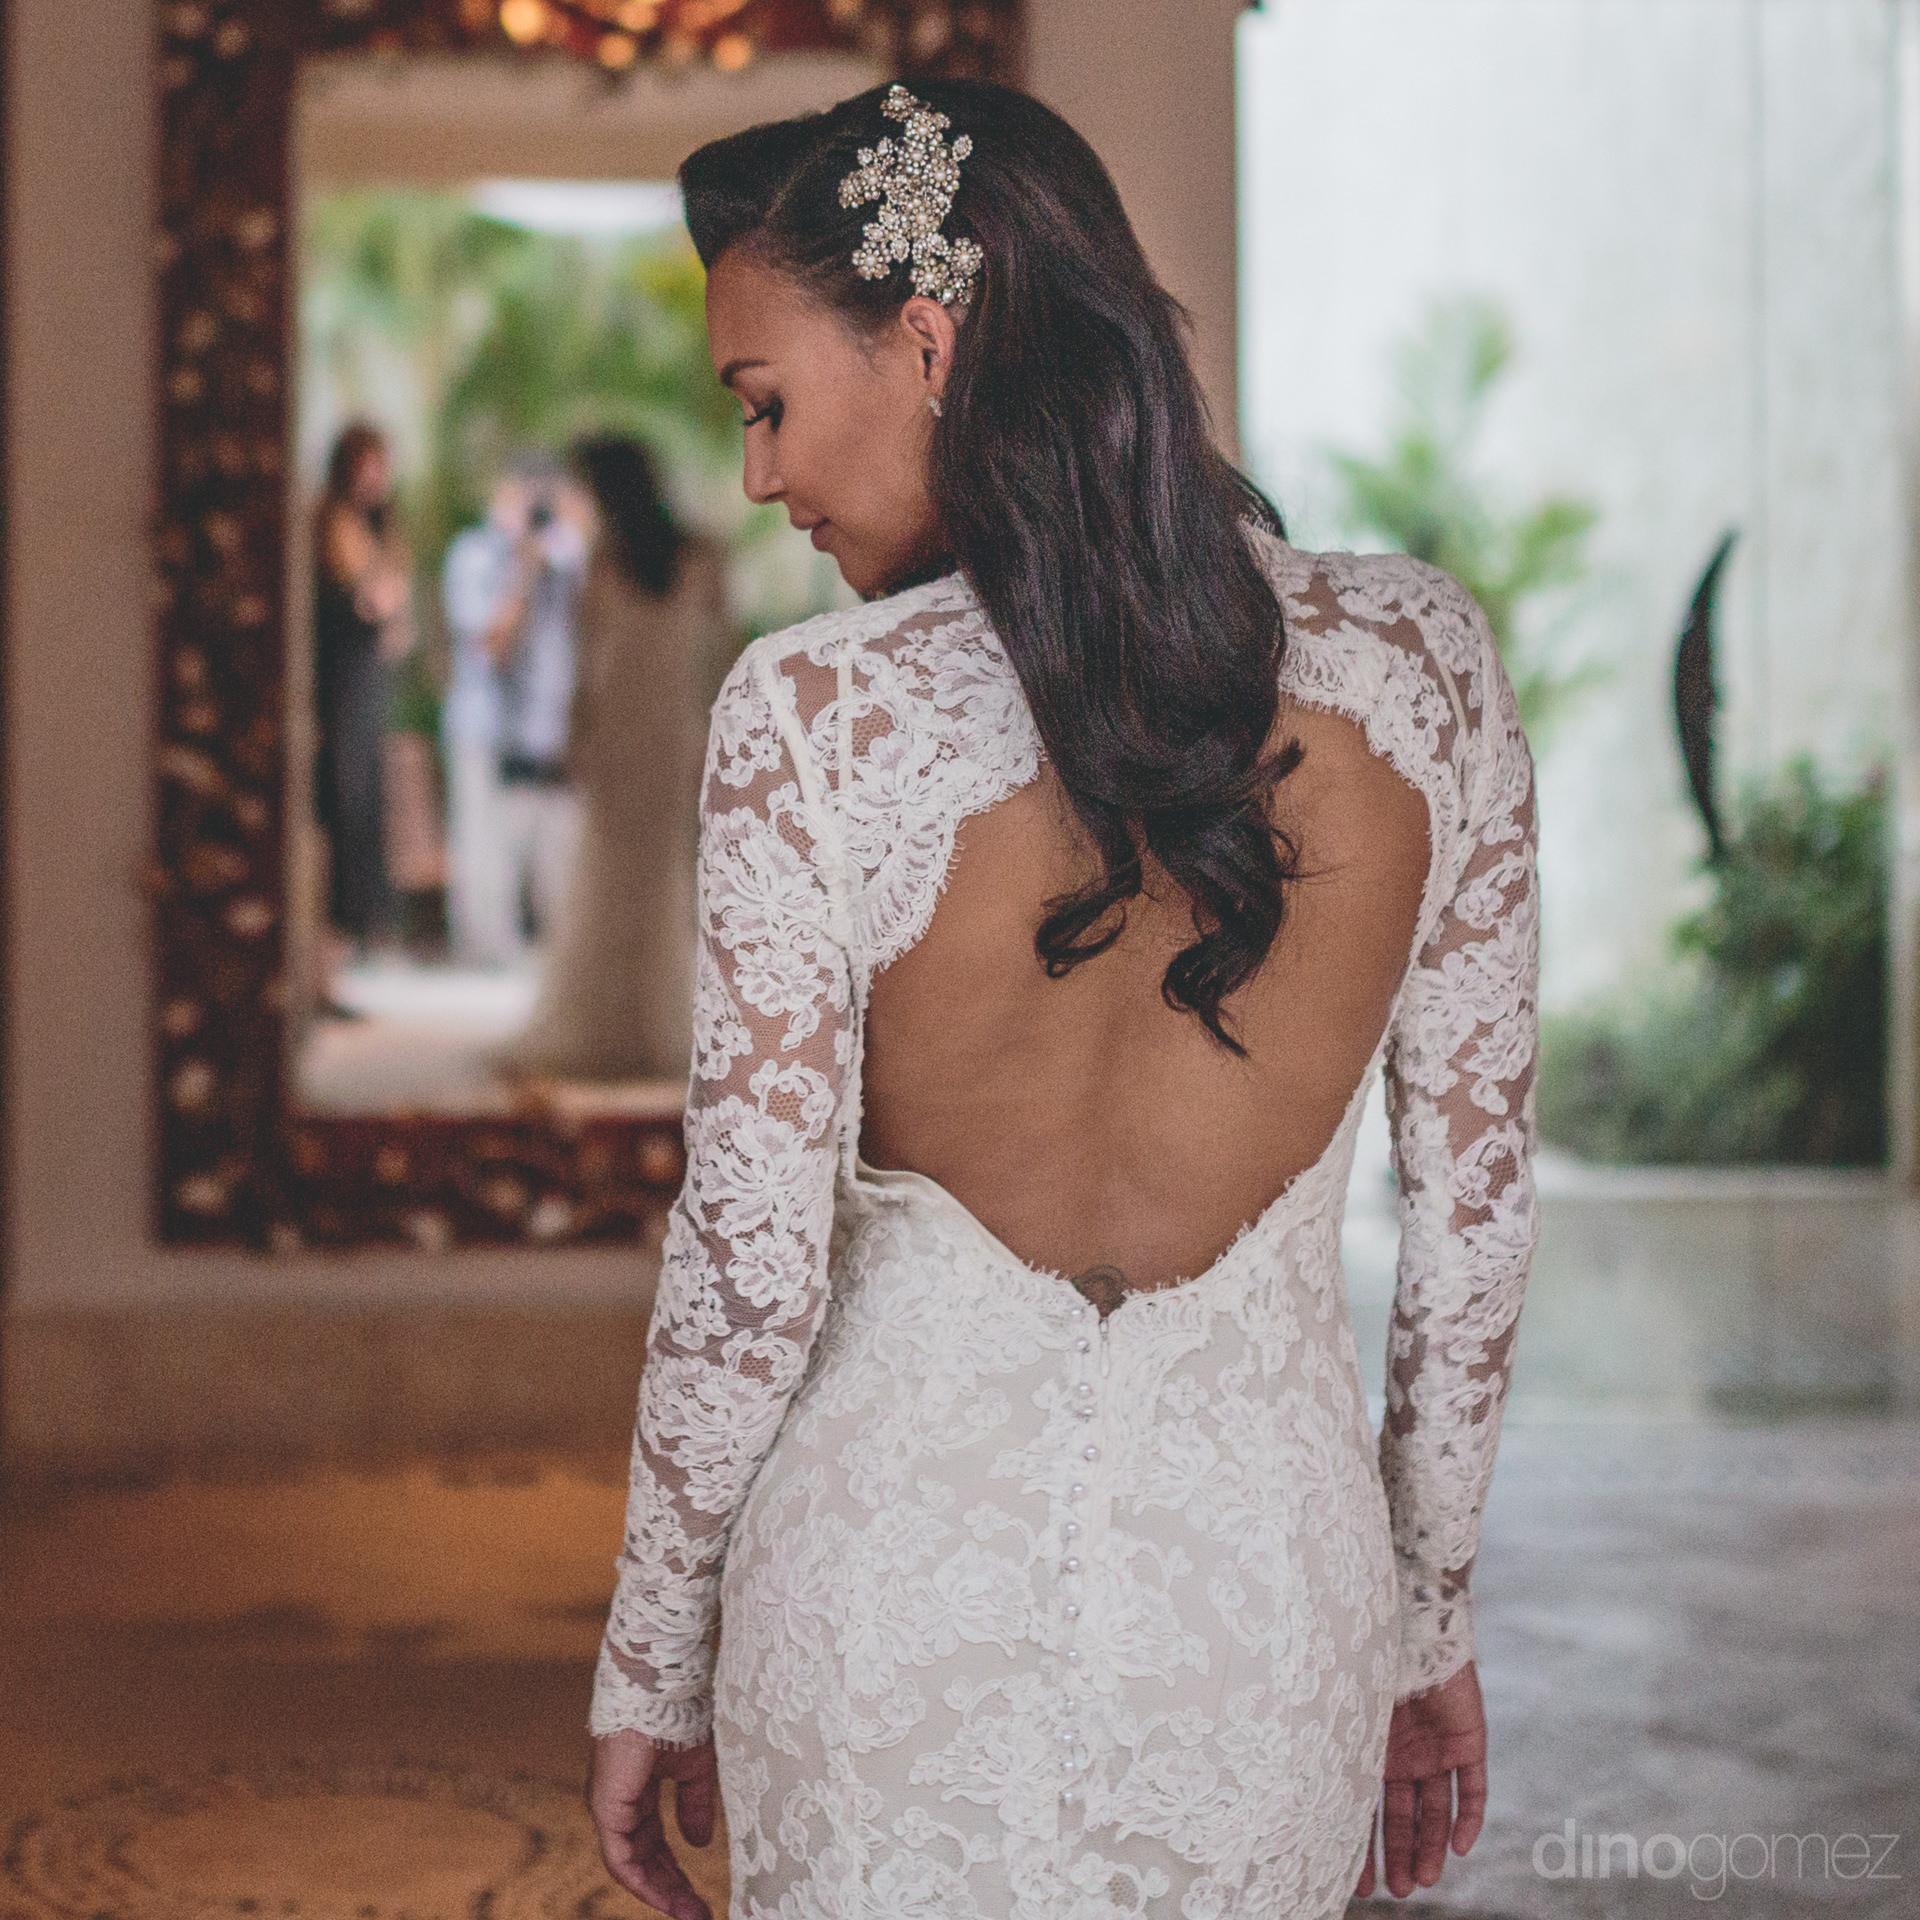 Naya Rivera Wedding Dress